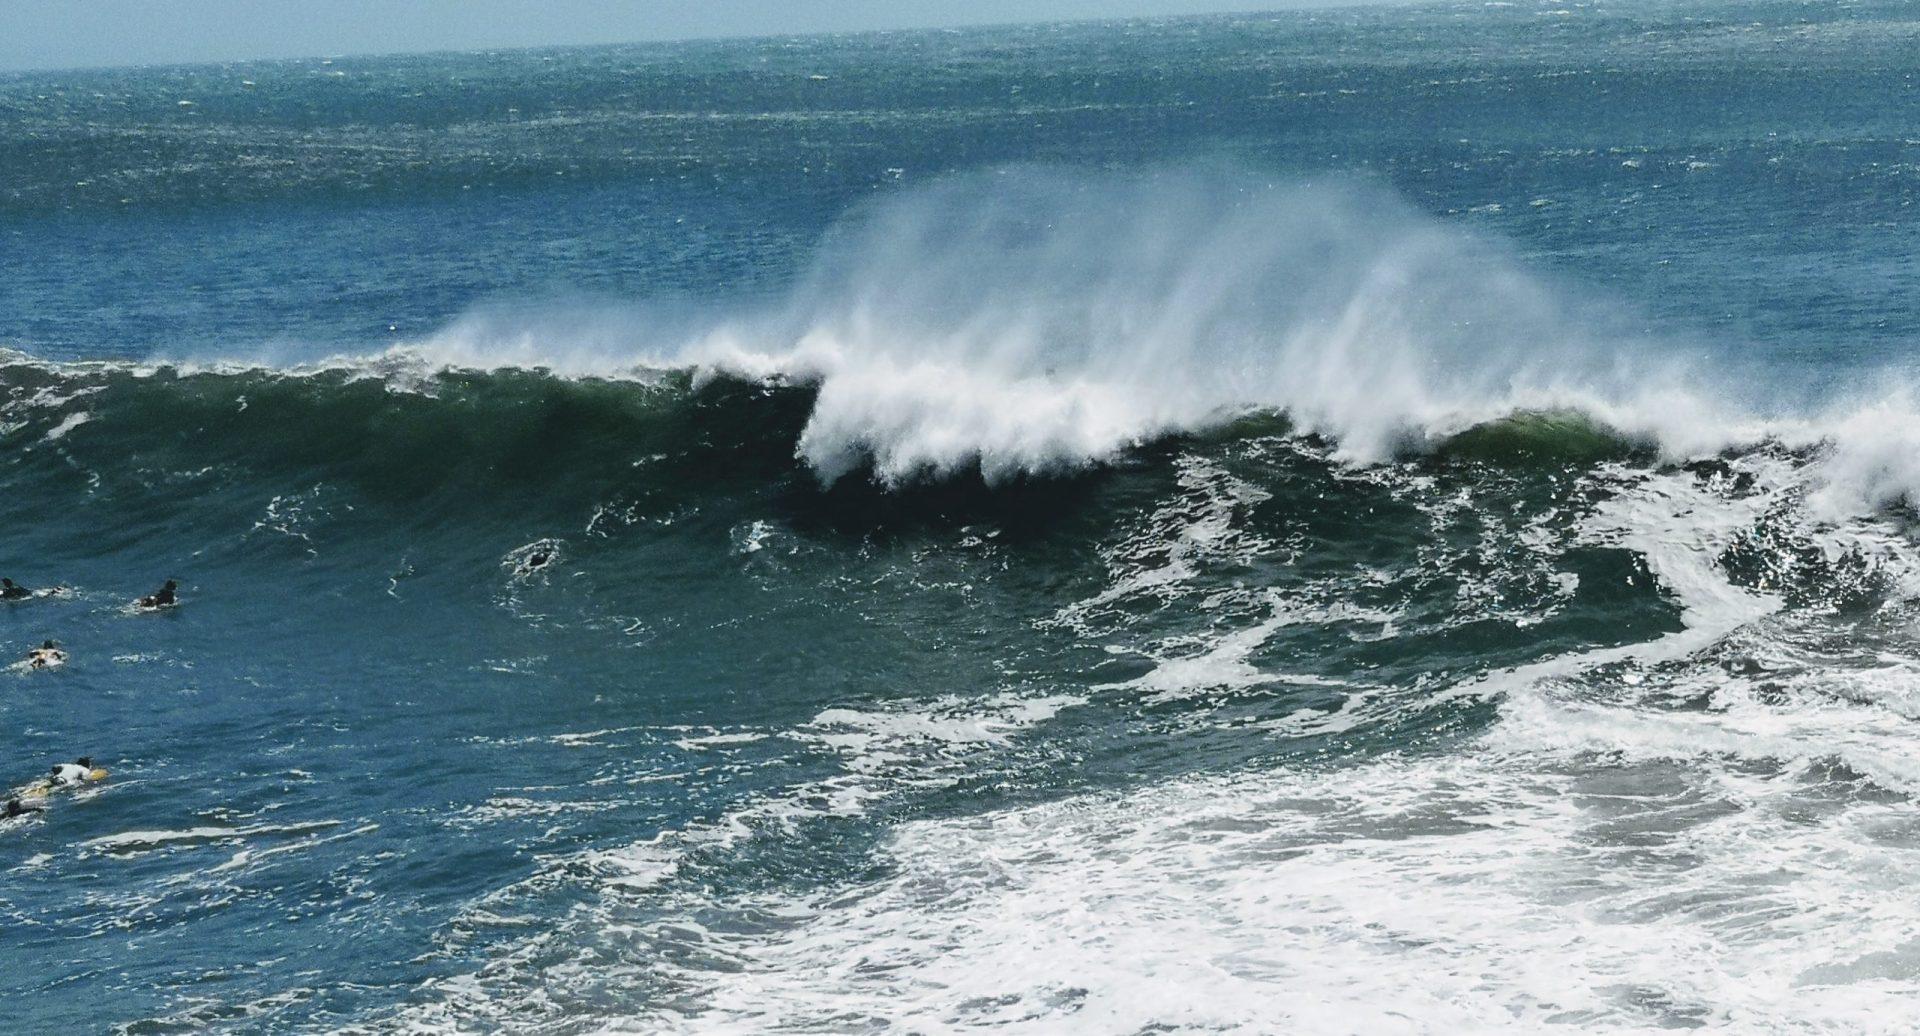 Noosa massive waves after 2019 February storm